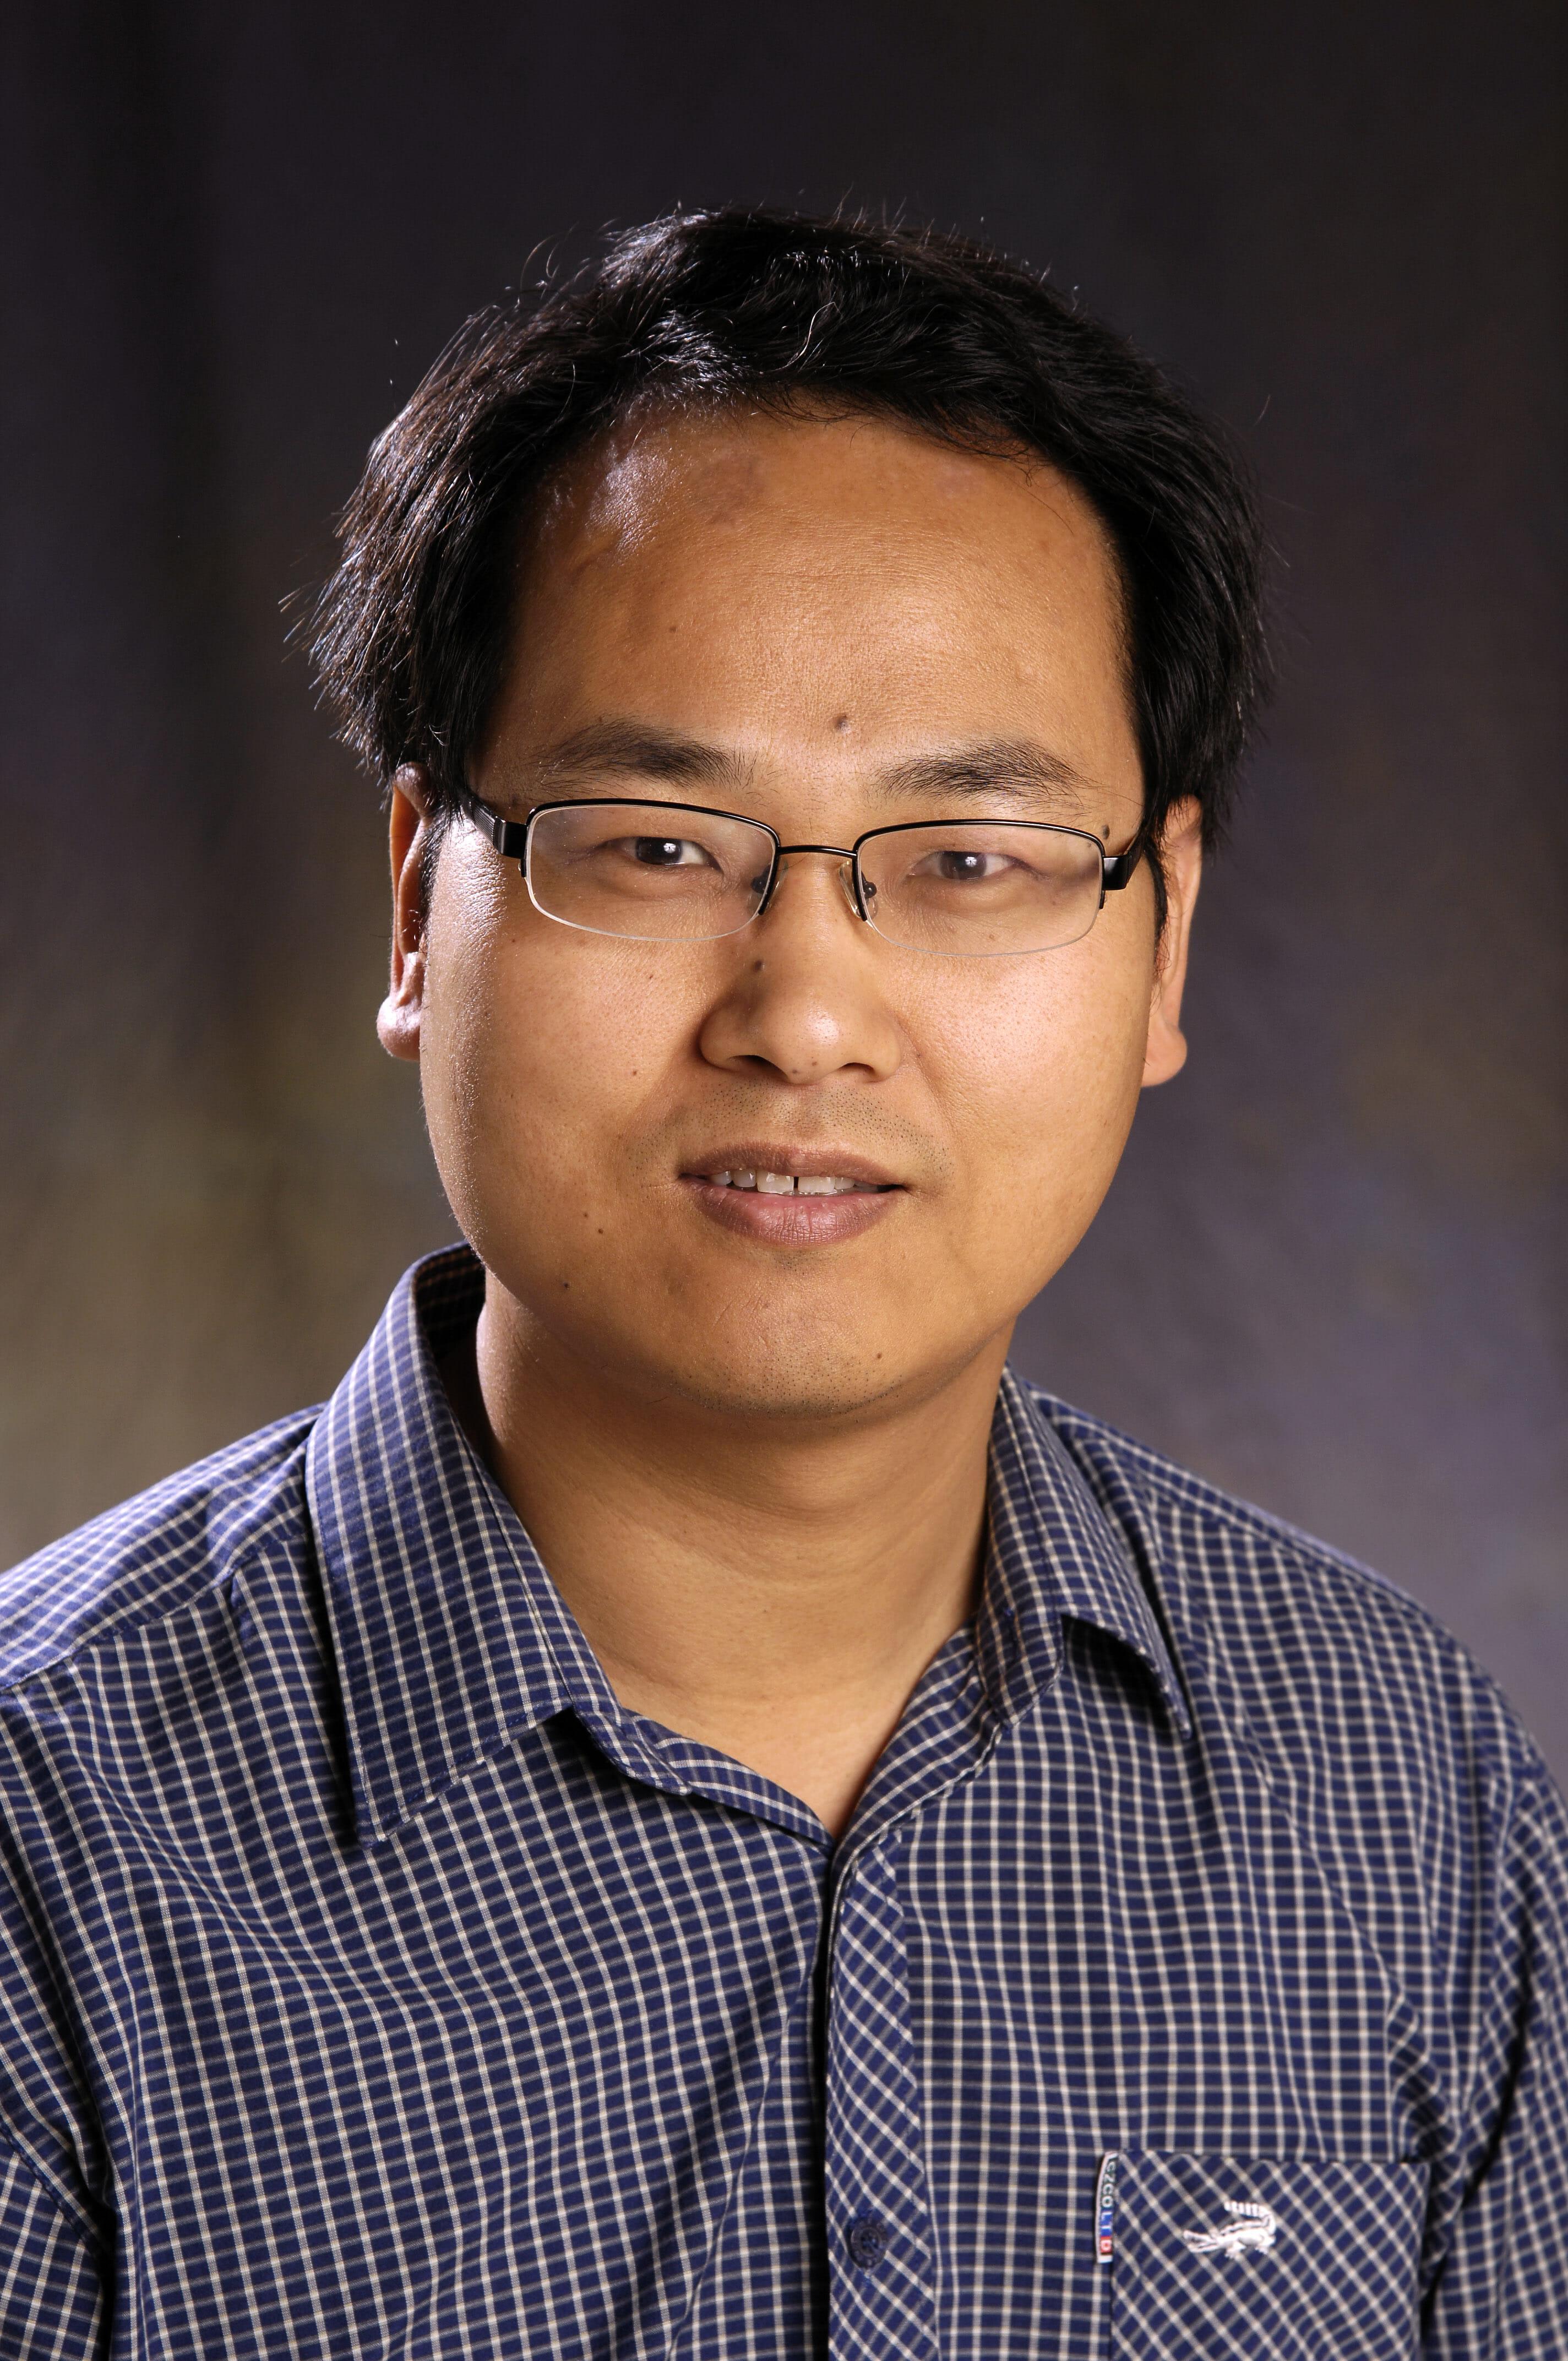 DR. JIJUN HAO